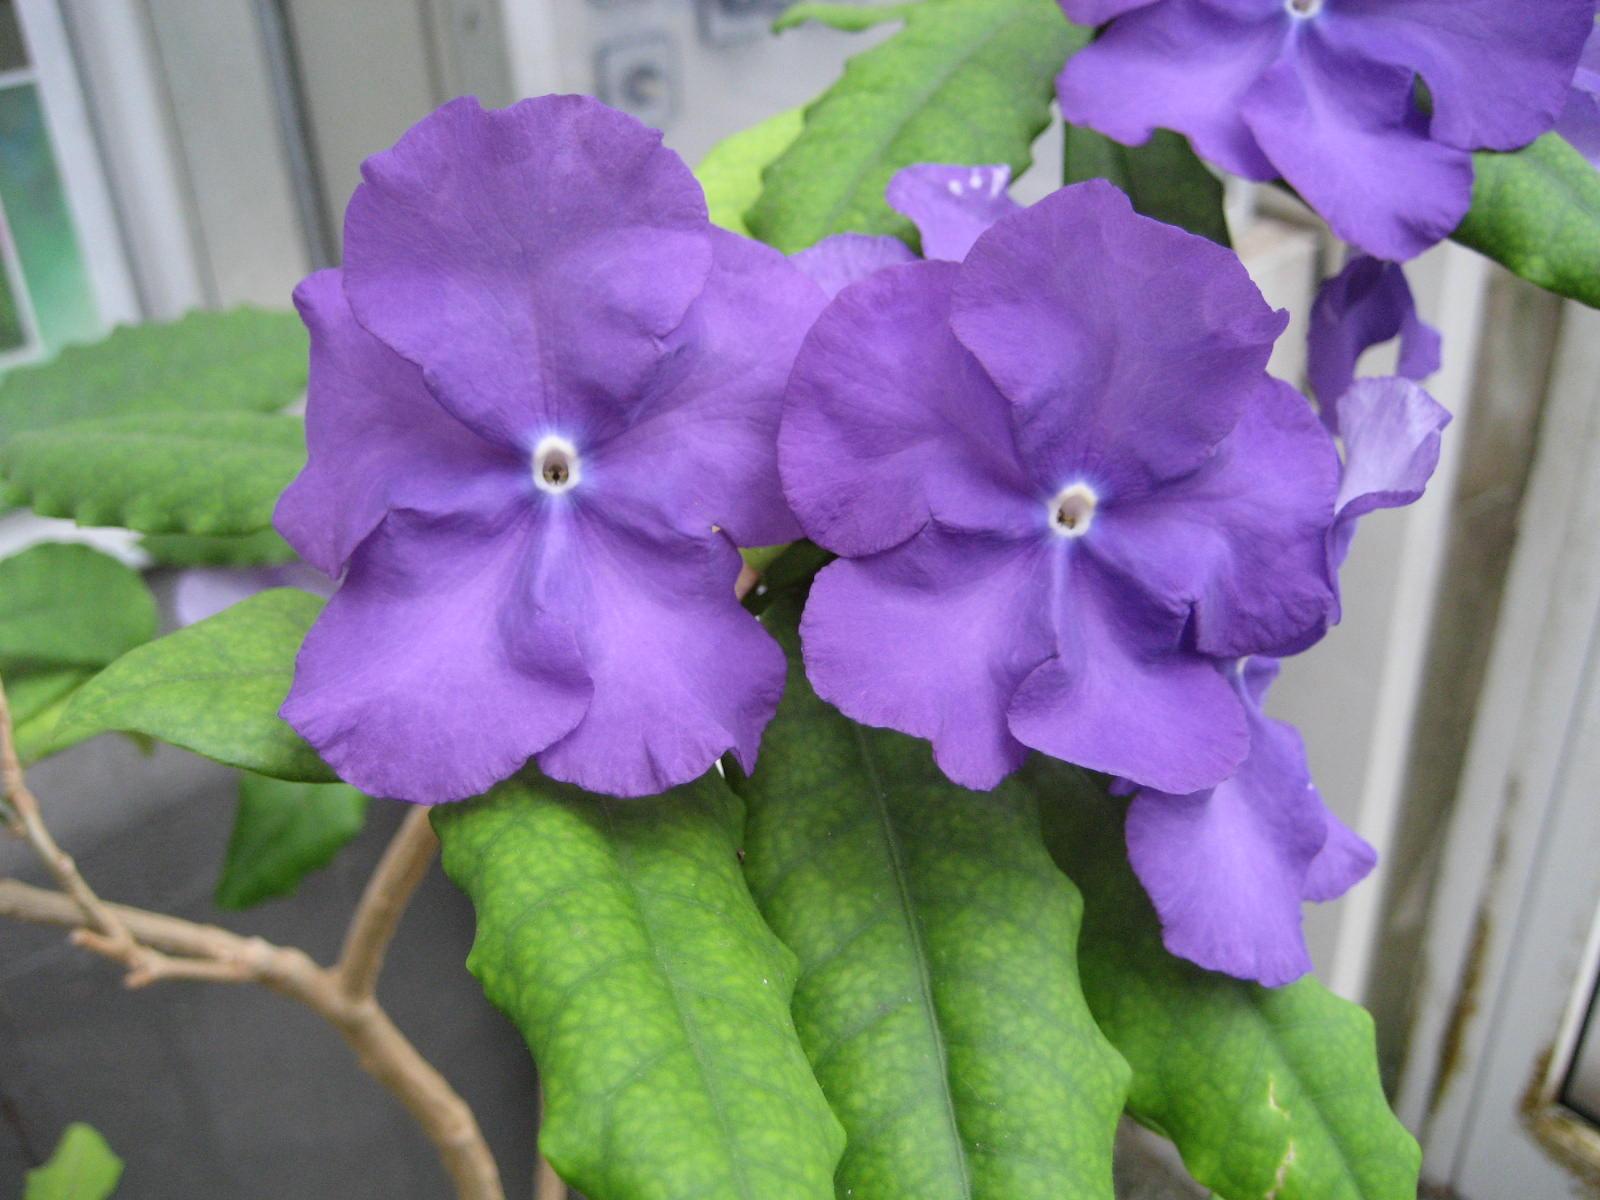 File:Brunfelsia pauciflora (Flower).jpg - Wikimedia Commons